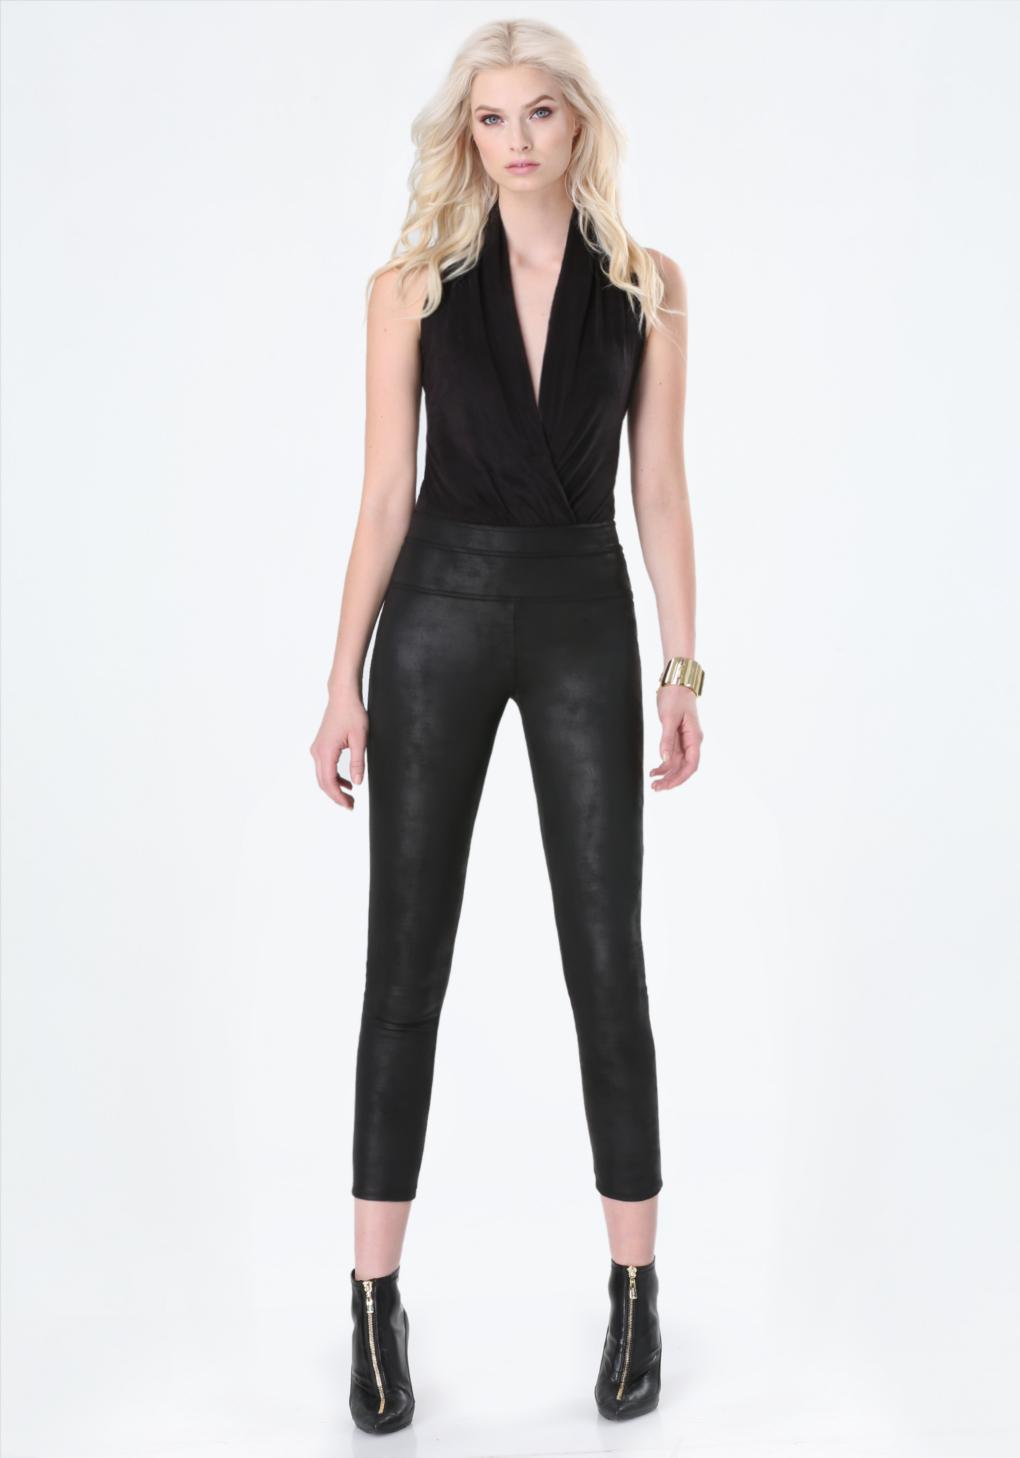 Lyst - Bebe Faux Suede Bodysuit in Black 3c9cd5fae